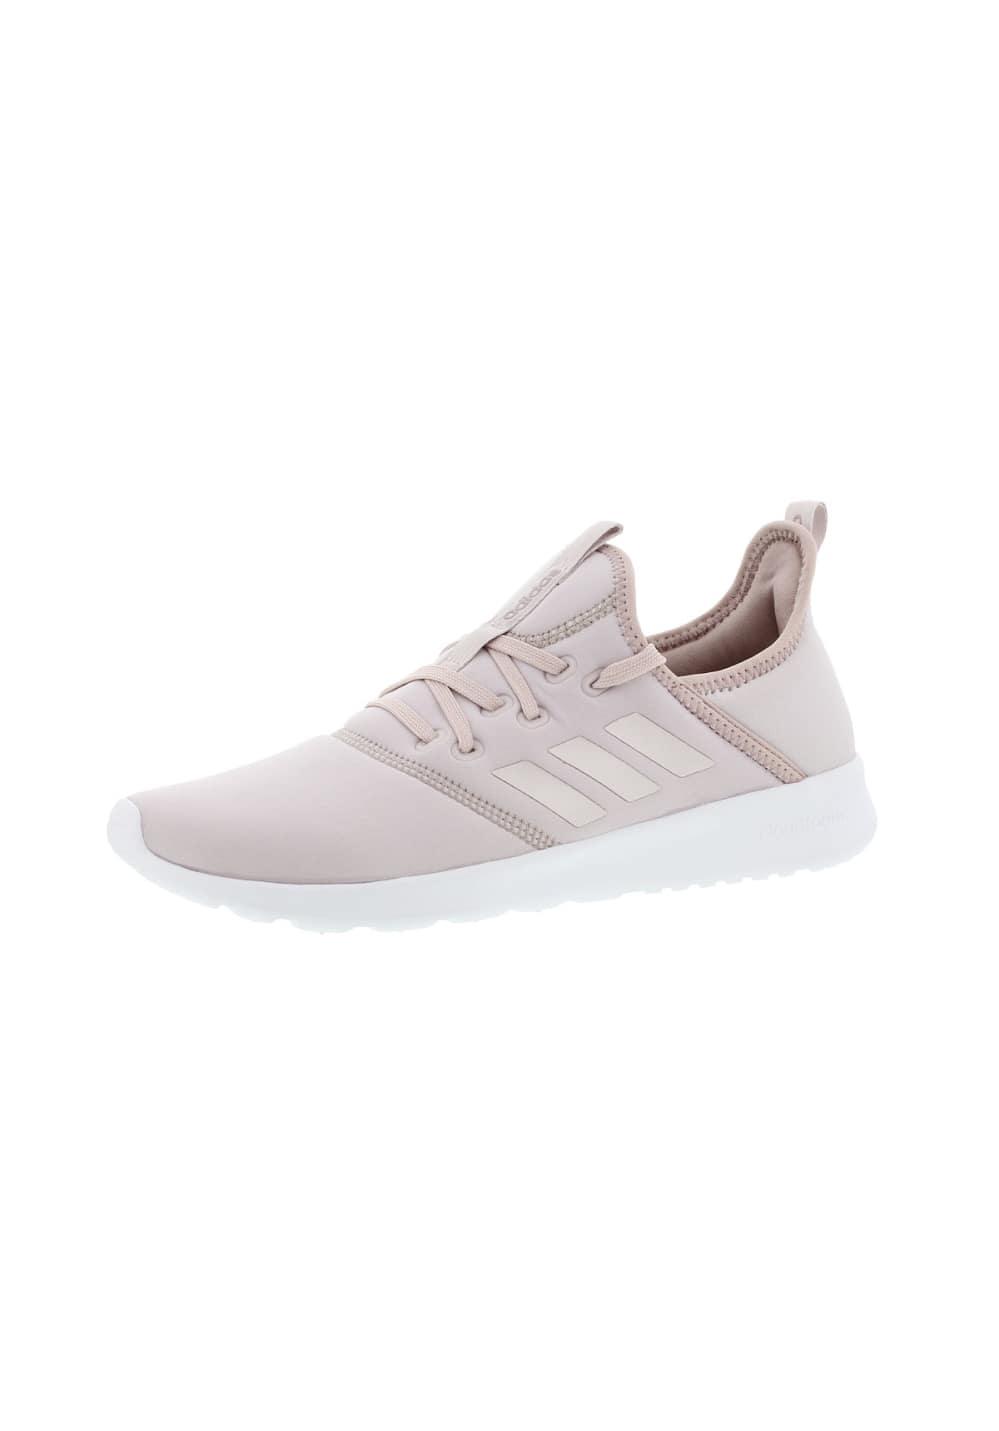 73762c7e0414 adidas neo Cloudfoam Pure - Running shoes for Women - Pink